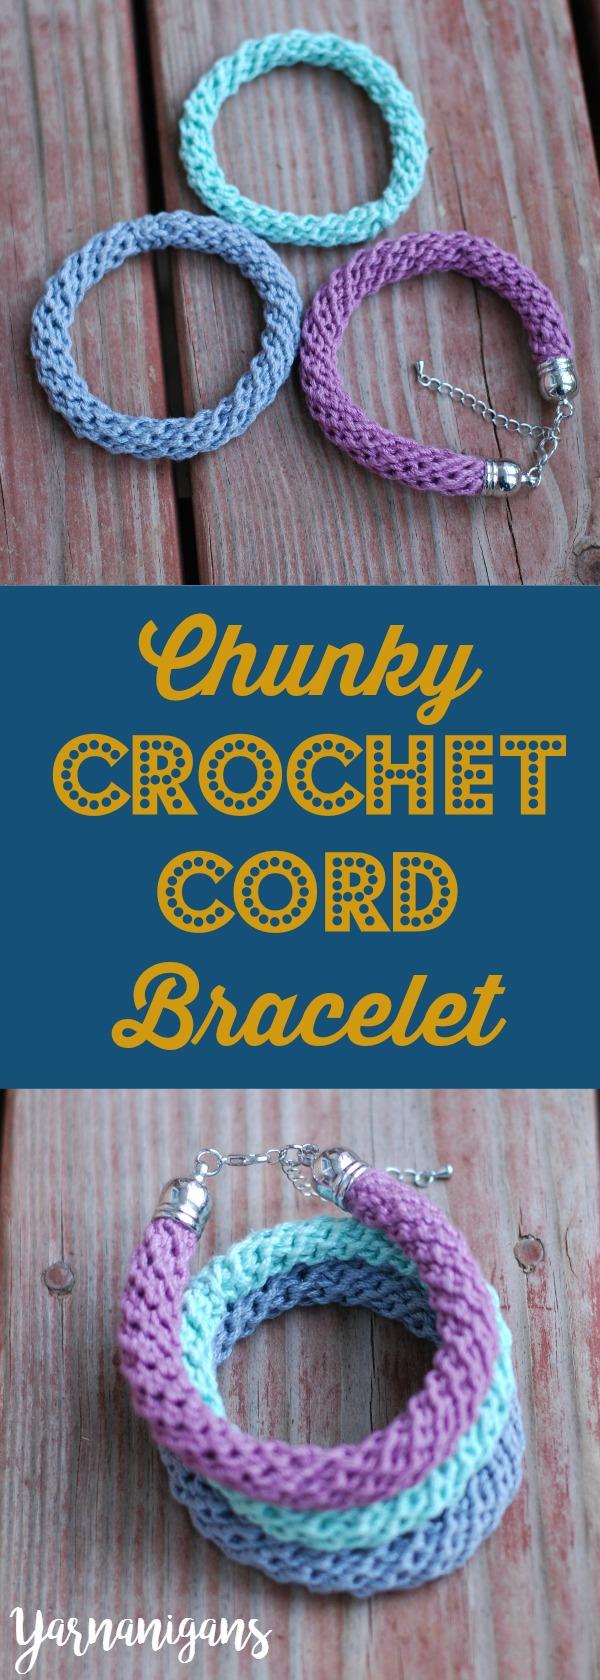 chunky crochet cord pinterest